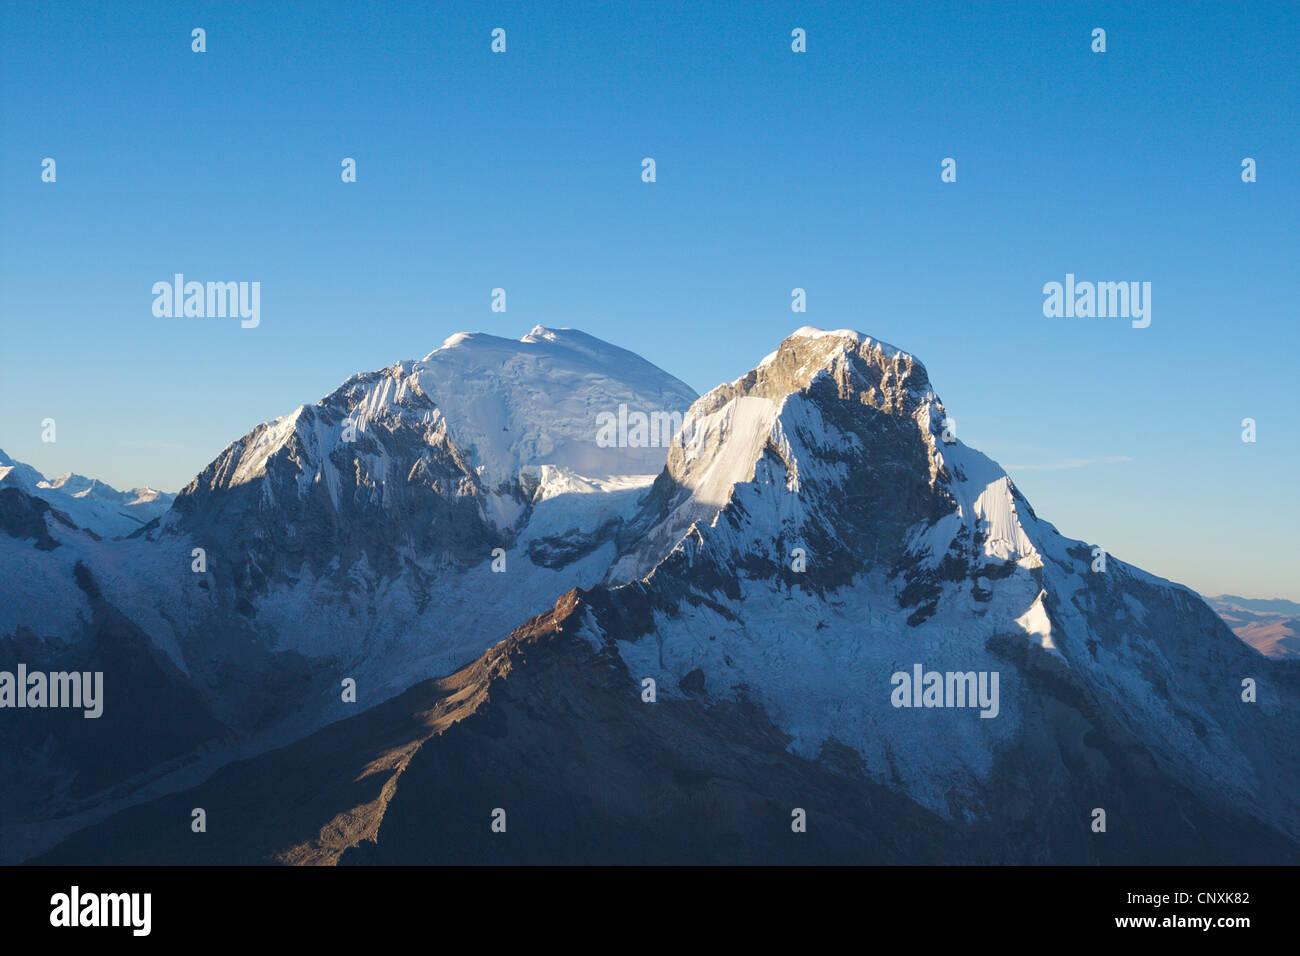 view from Navado Pisco to Huascaran, Peru, Andes, Cordillera Blanca Stock Photo